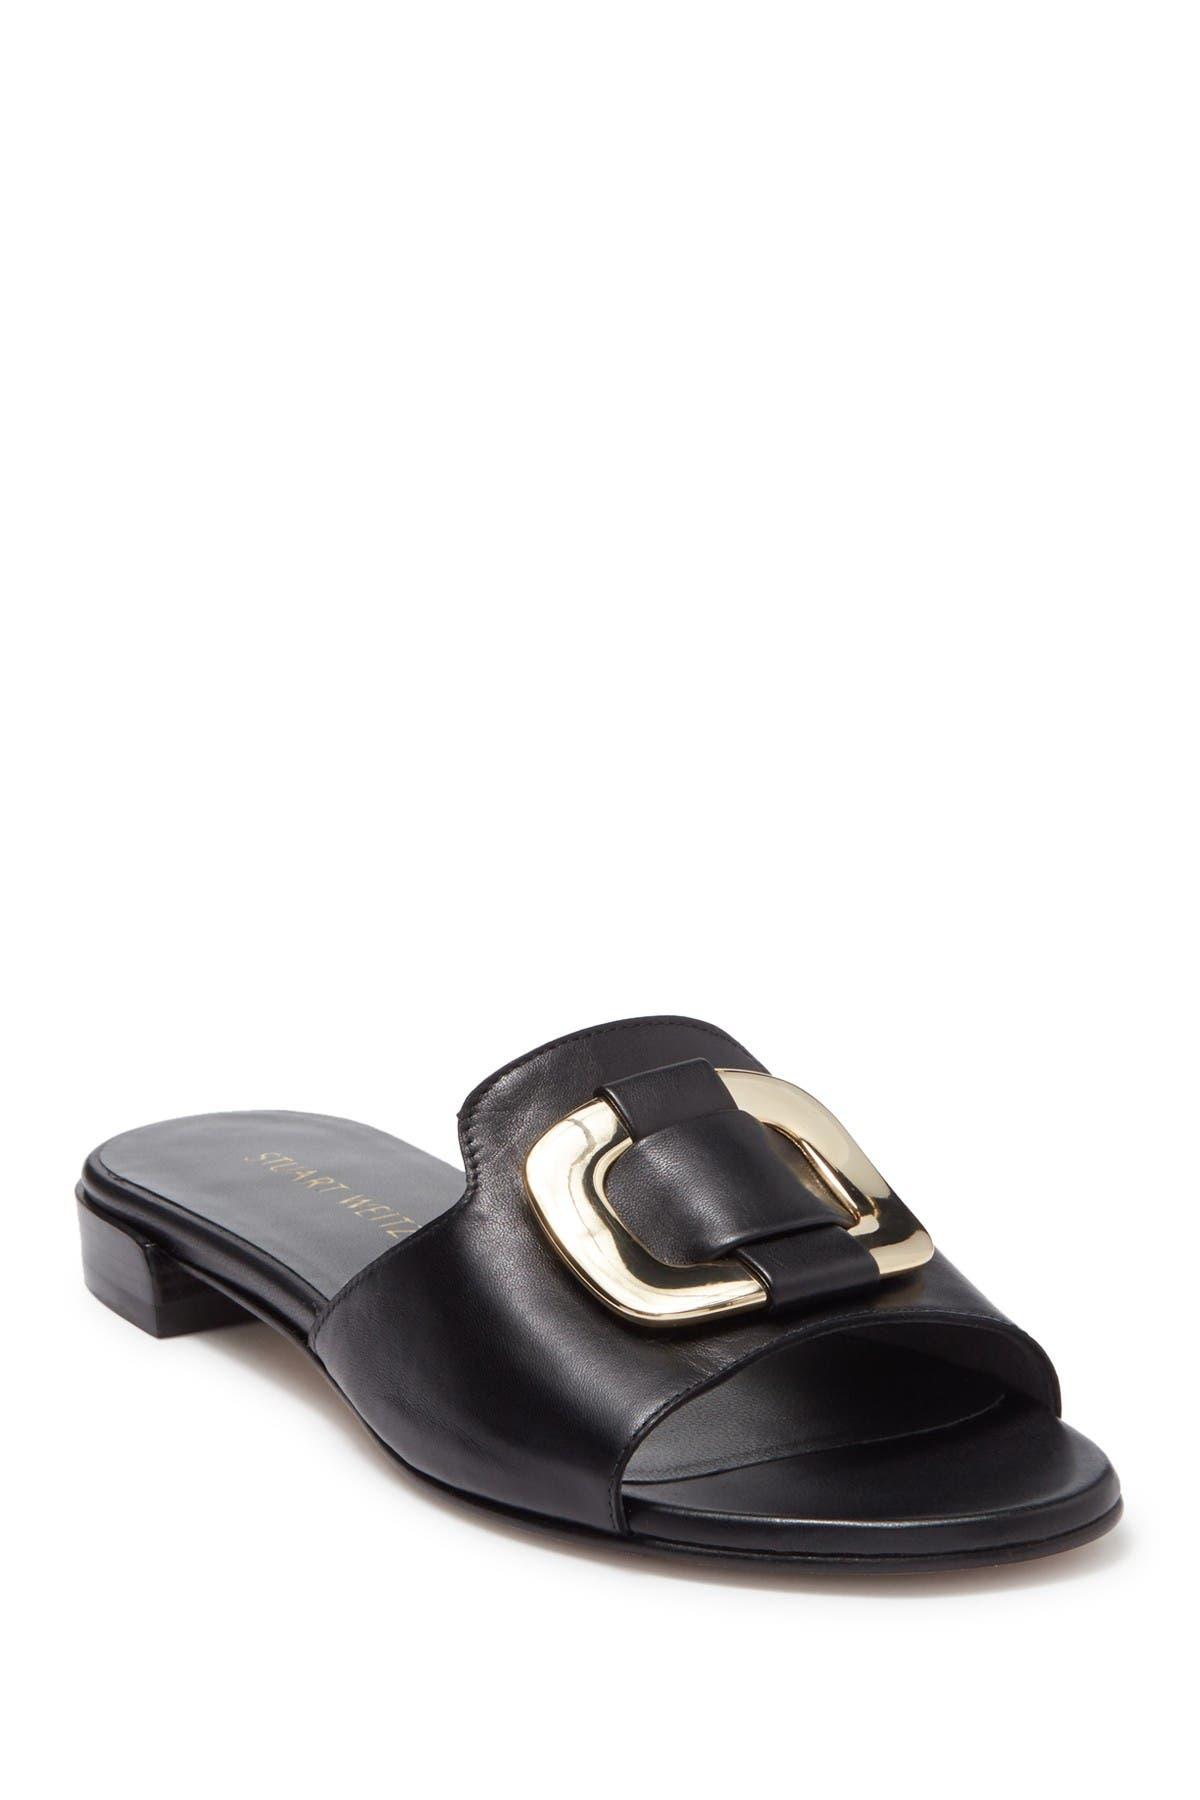 Stuart Weitzman | Odeon Slide Sandal